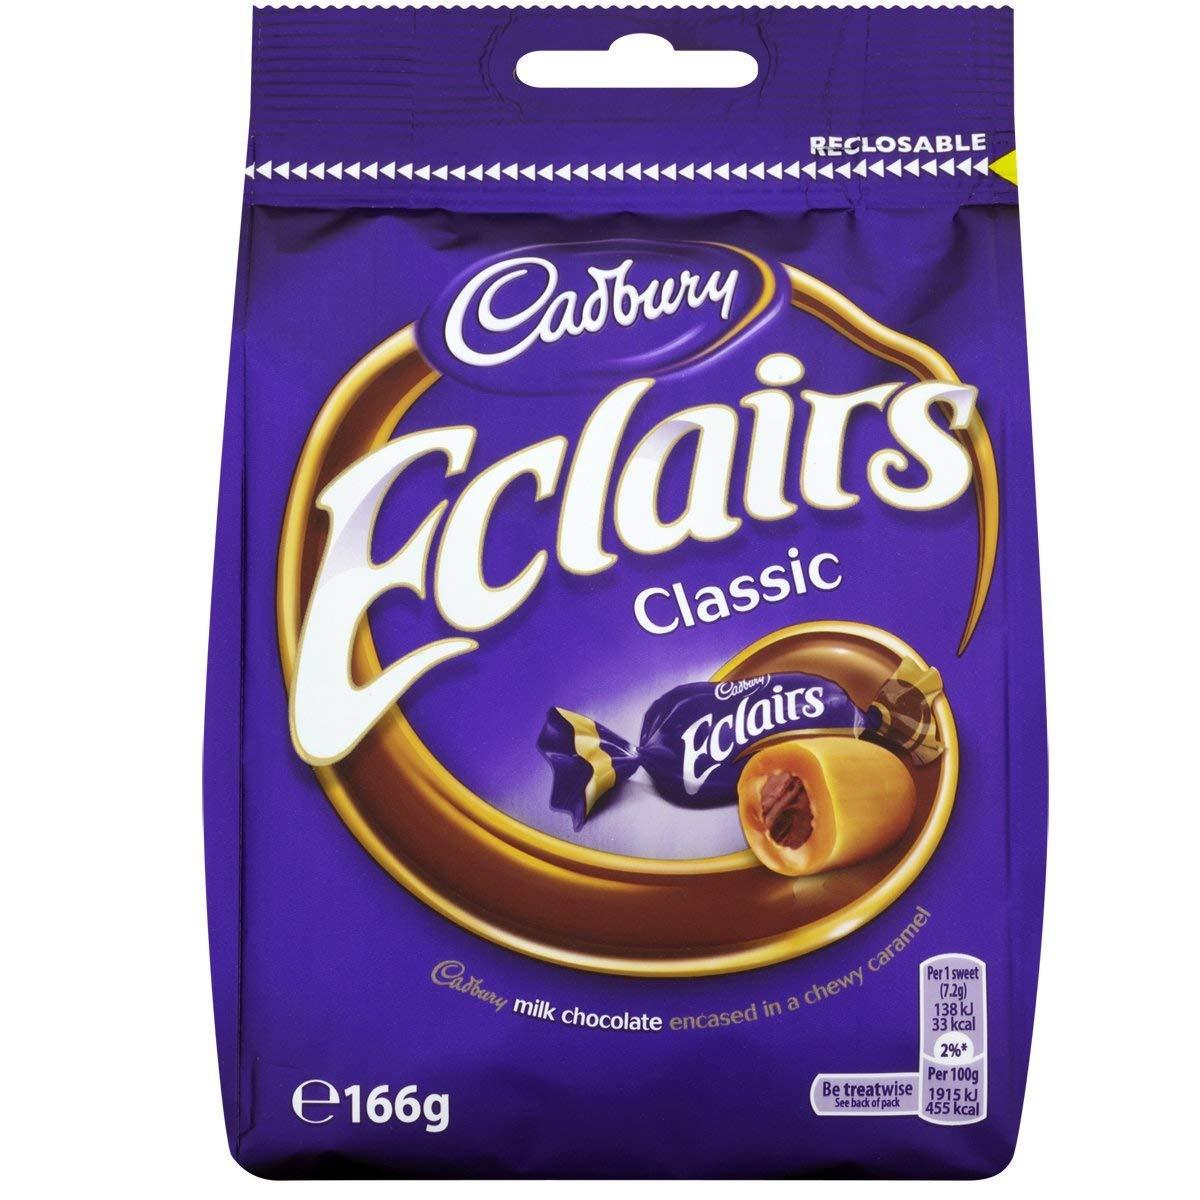 Cadbury Eclairs Classic - 166g (pc)